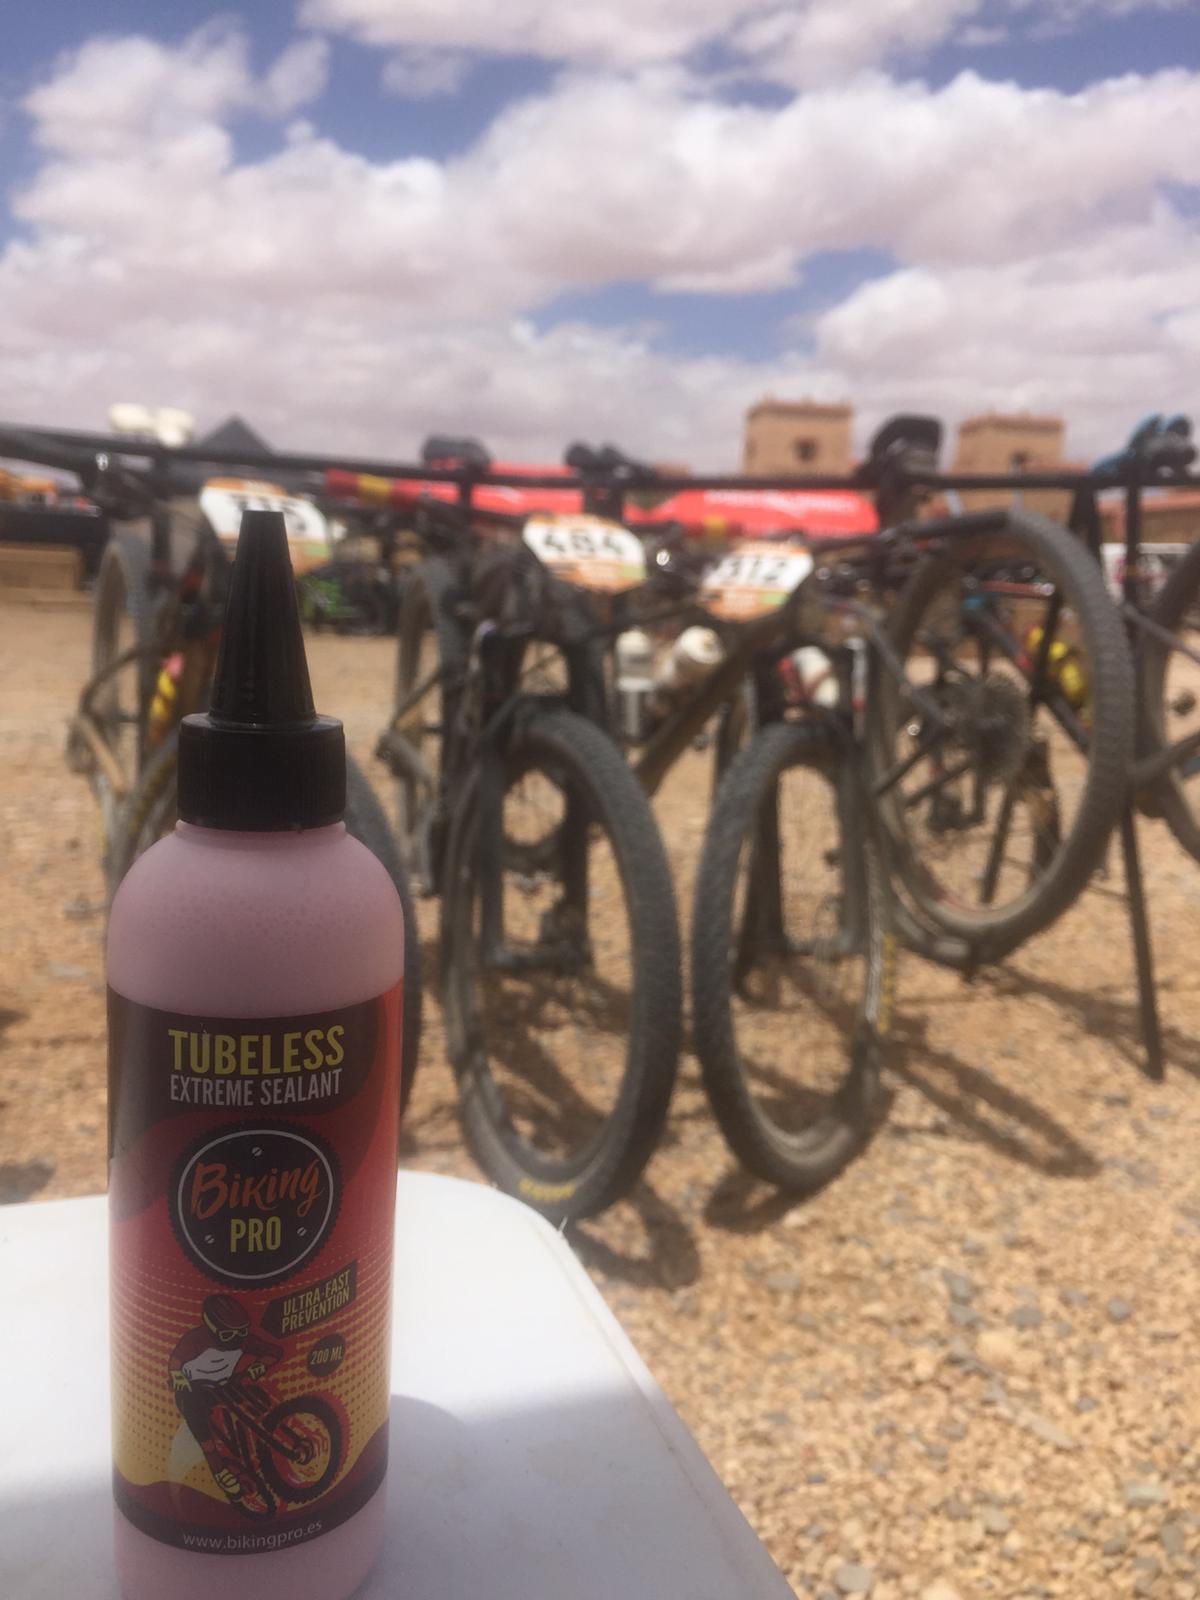 Biking Pro Extreme Sealant